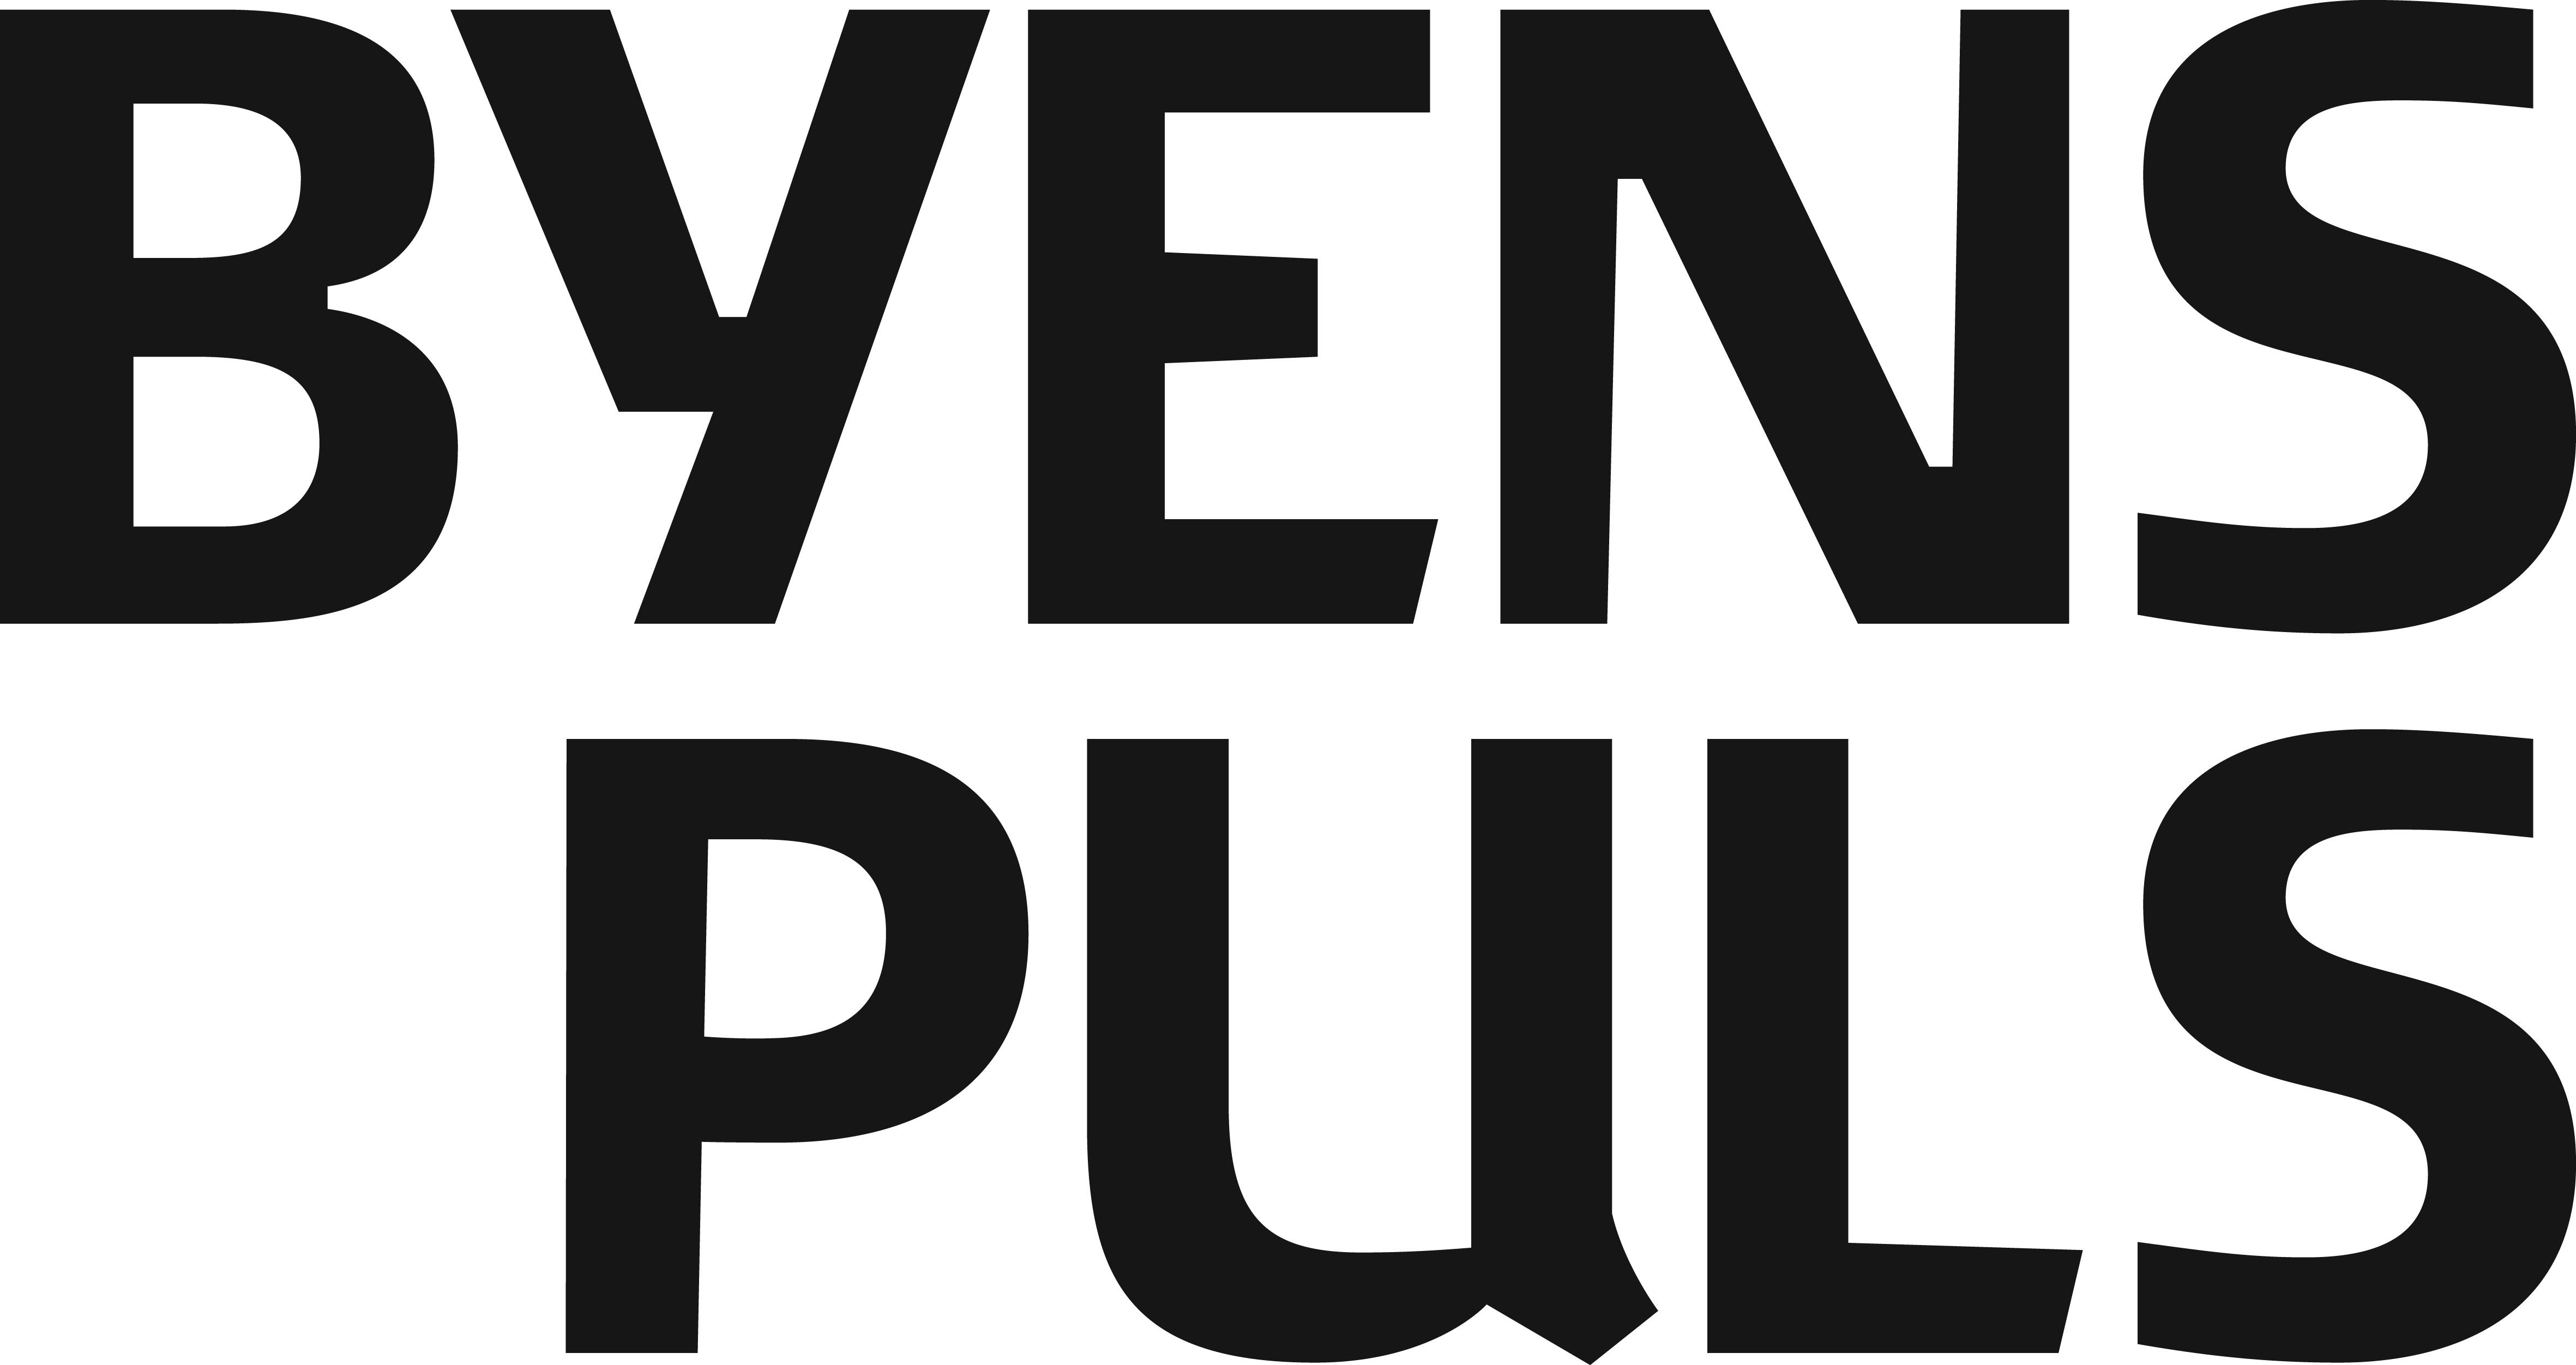 Media 2017 Byens Puls Mediedatabasen For Specialmedier Udgivet